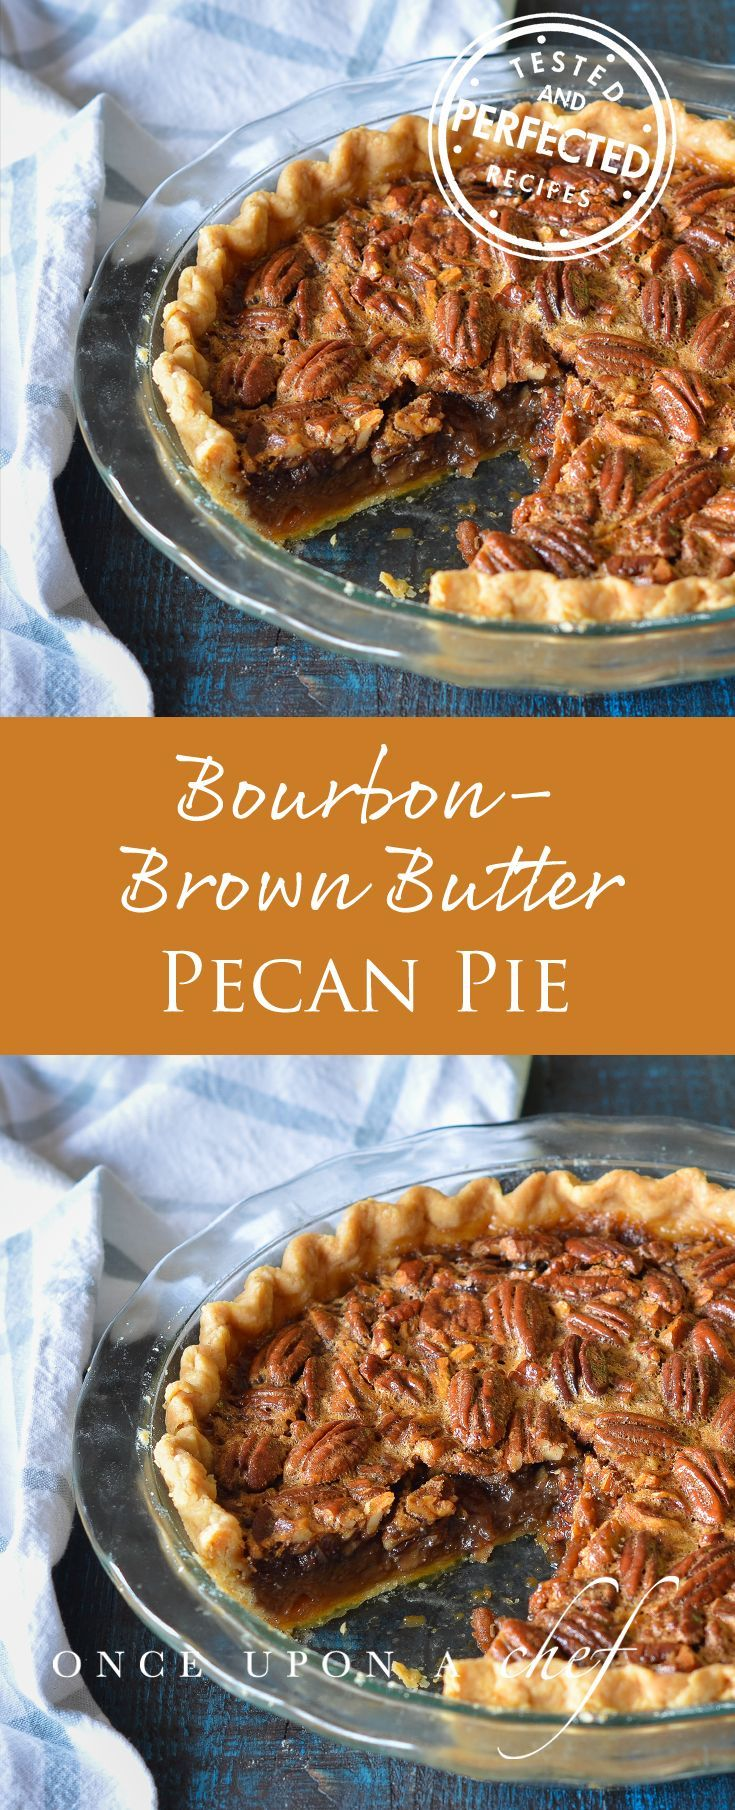 Bourbon-Brown Butter Pecan Pie #pecanpie #dessertrecipe #thanksgiving